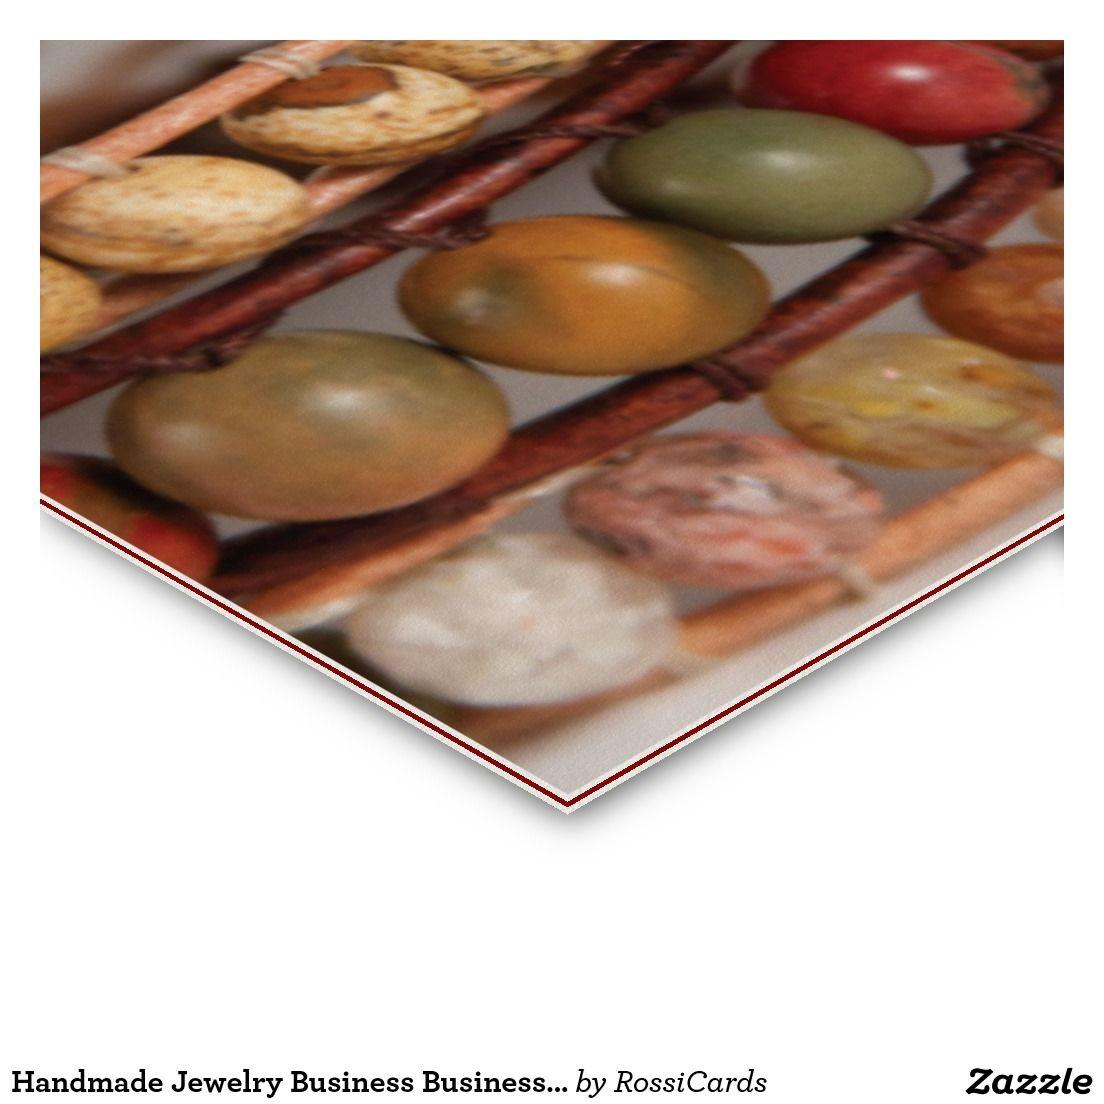 Handmade Jewellery Business Business Card | Handmade jewelry ...